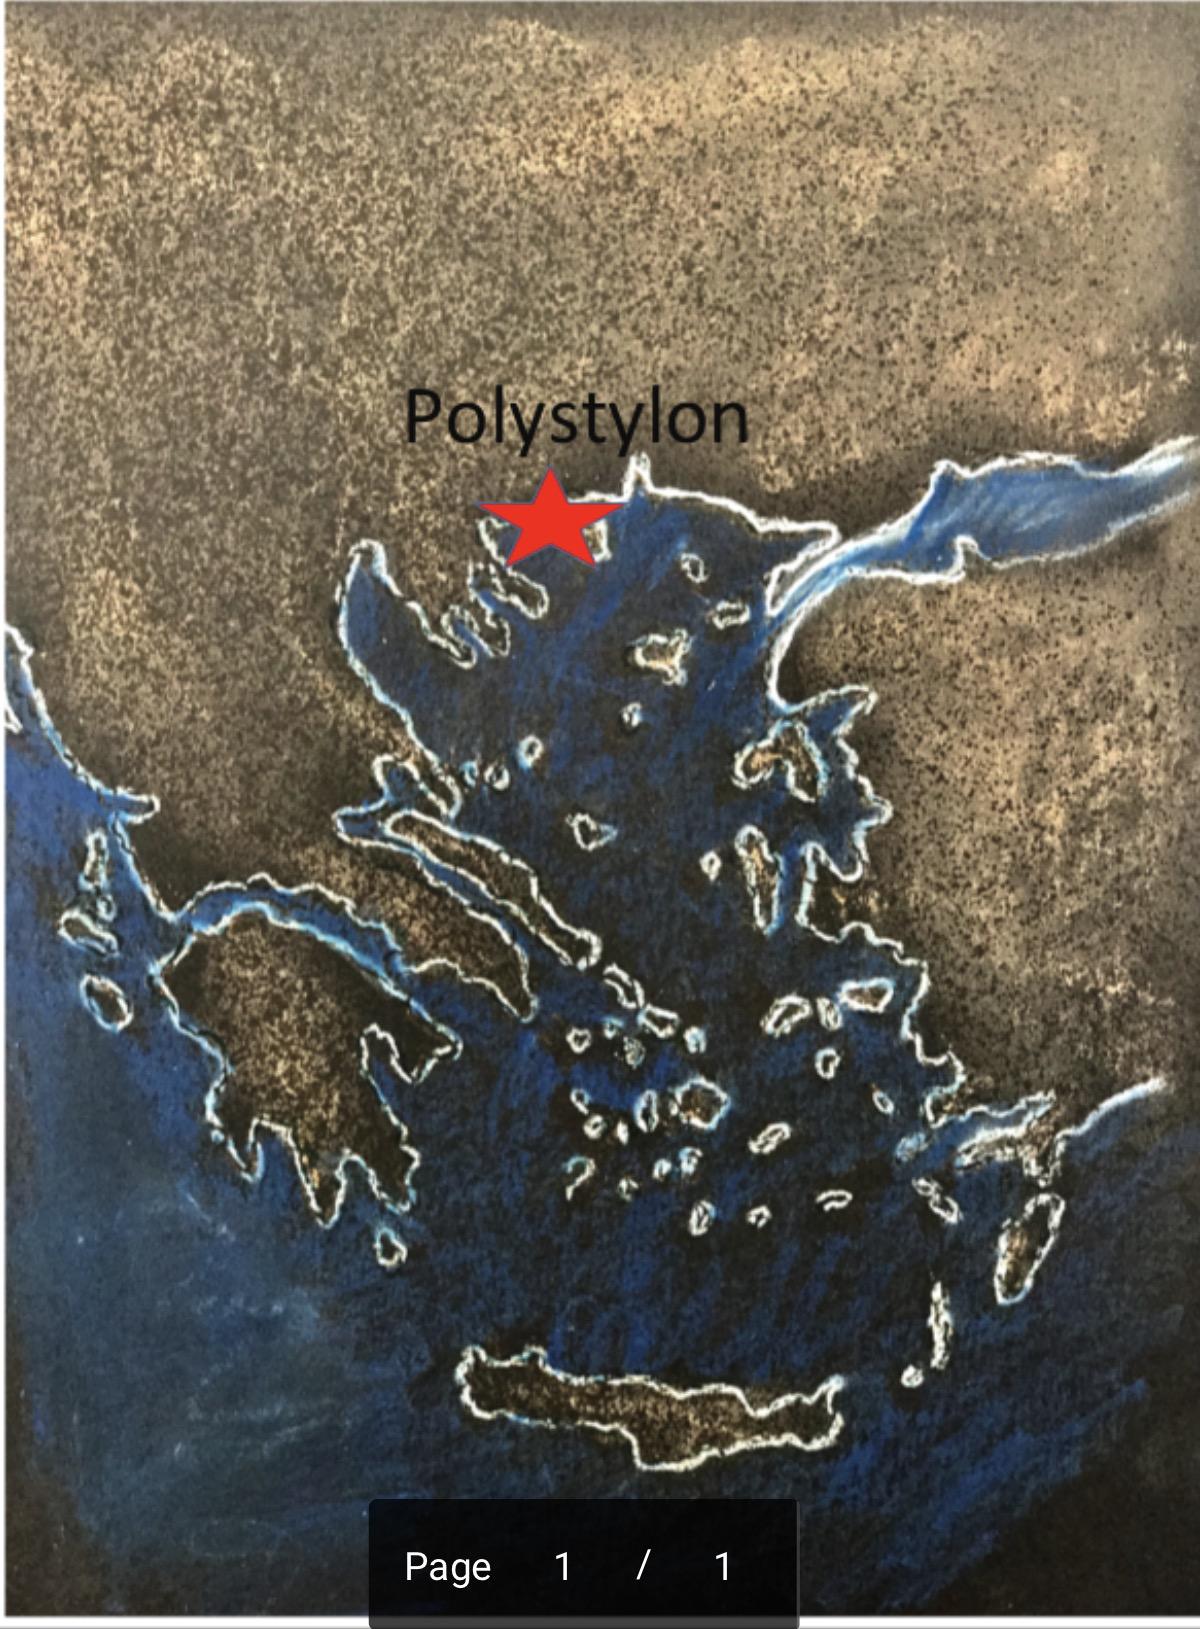 Location of Polystylon